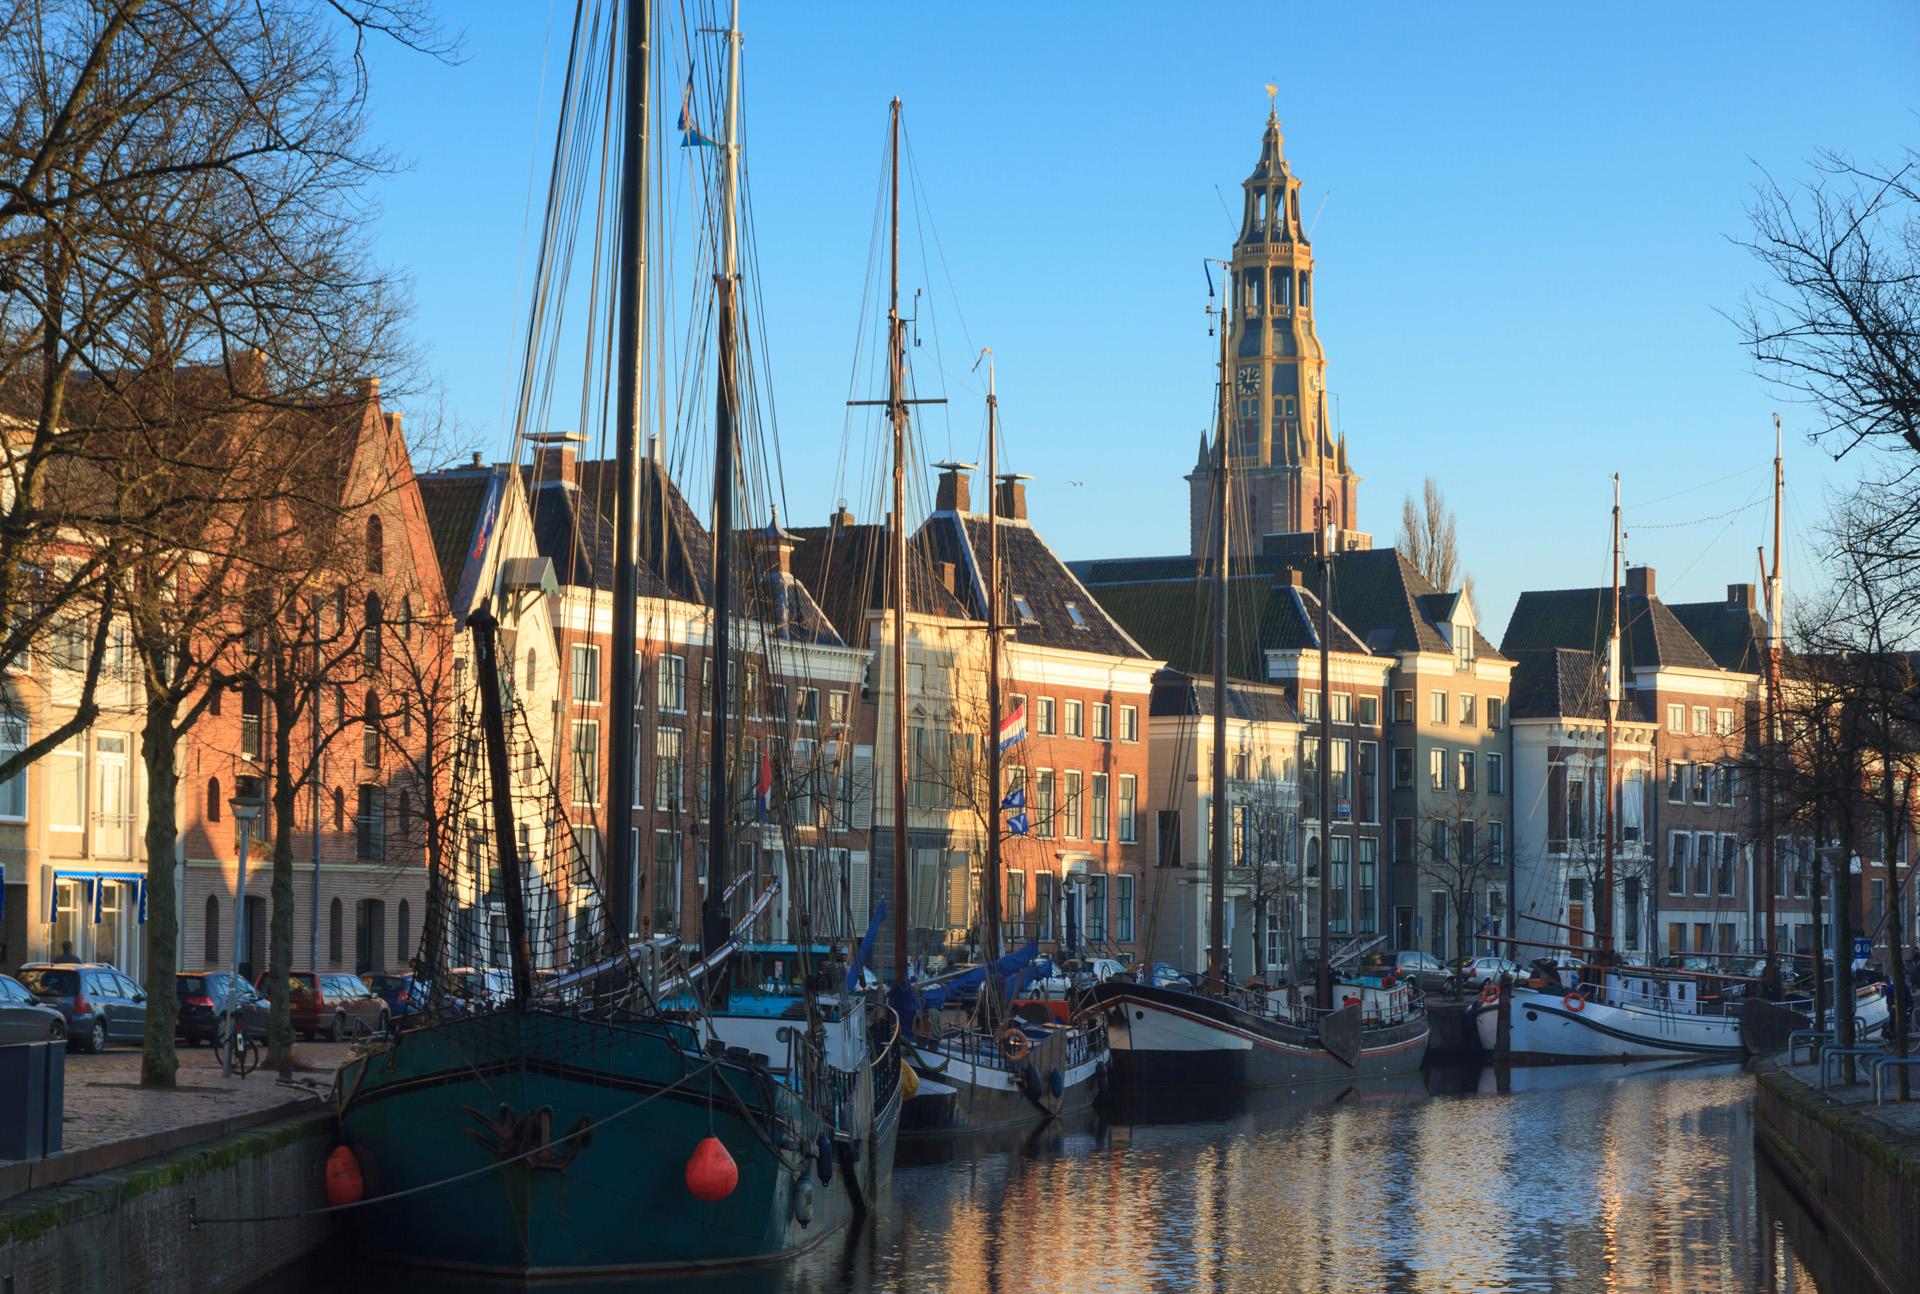 Dagje uit Groningen stad